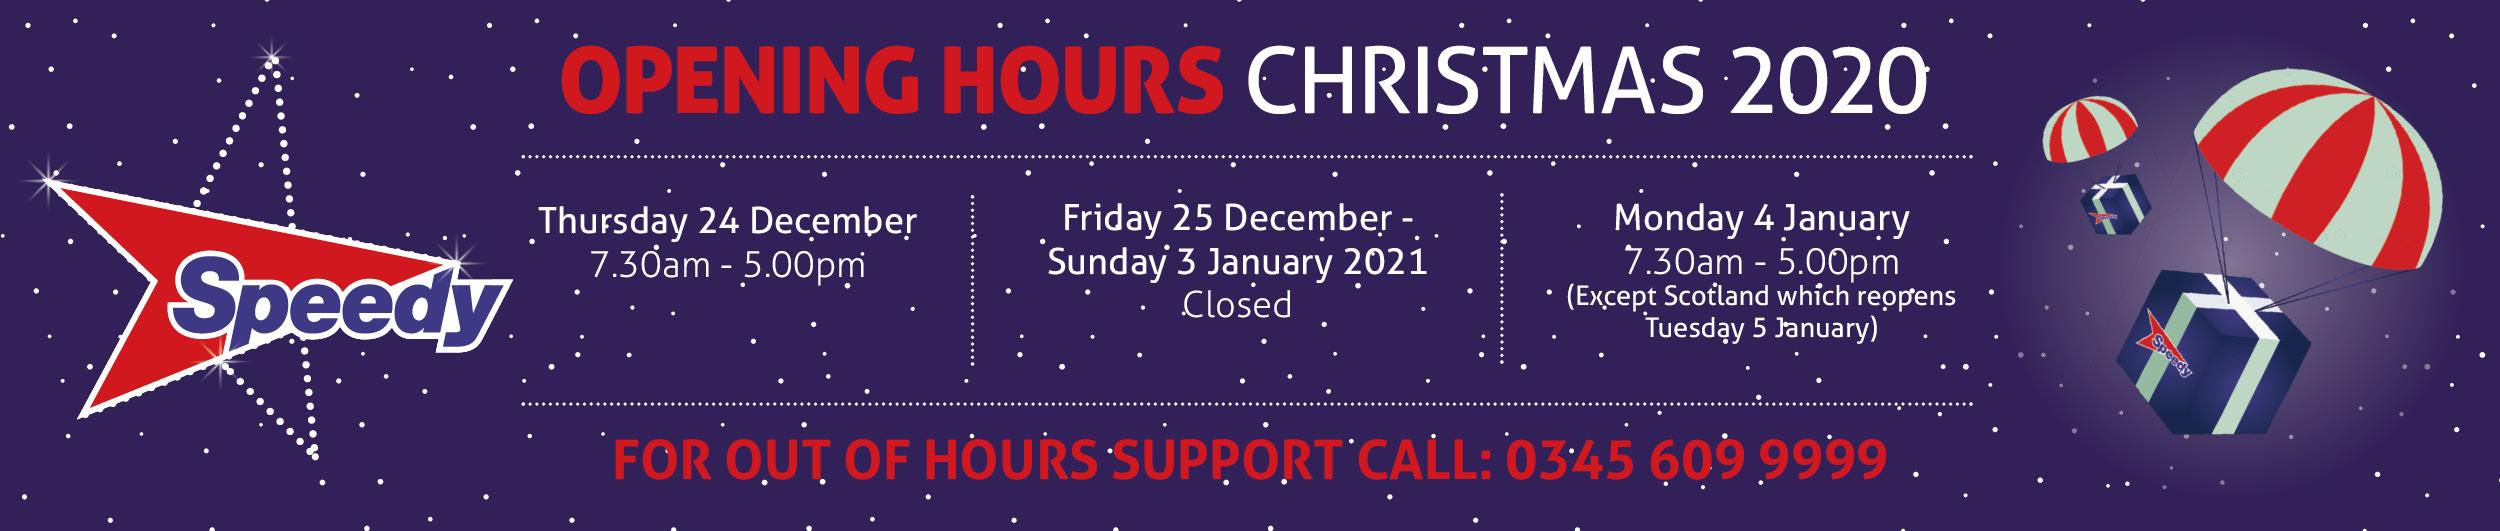 Christmas Opening Times Web banner 2020.jpg